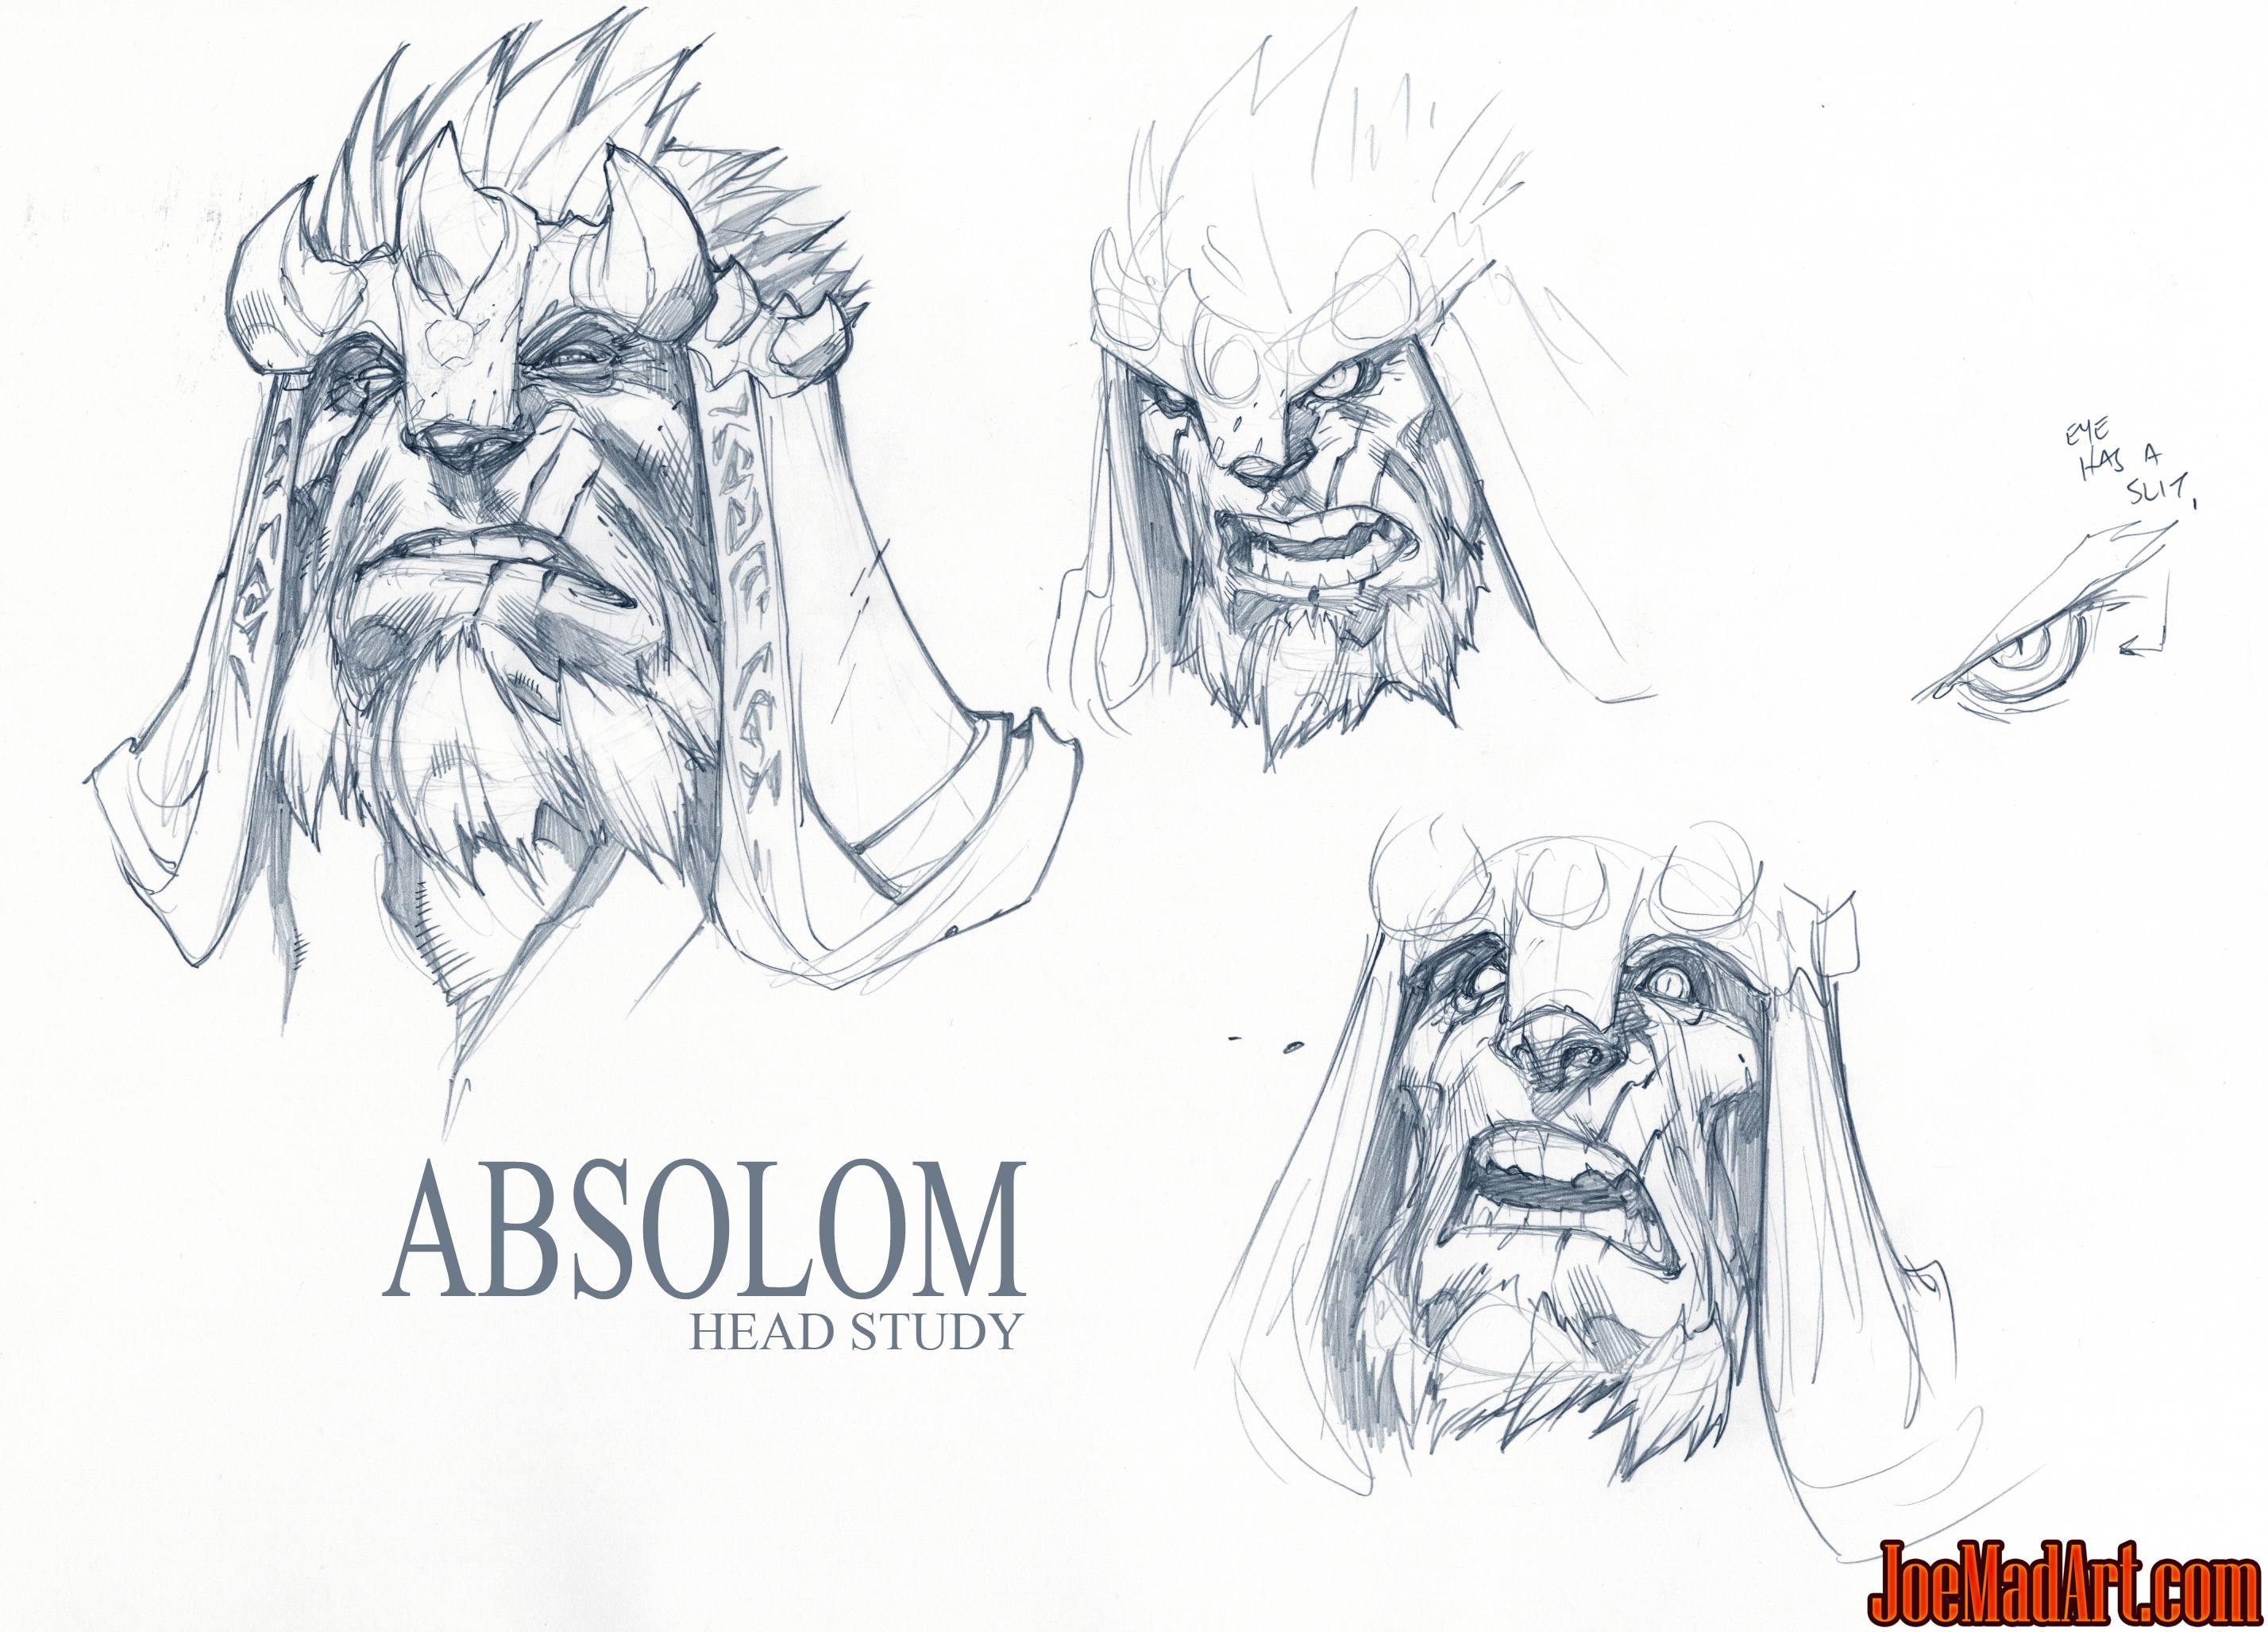 joemadart com  darksiders 2  absalom head concept art sketches